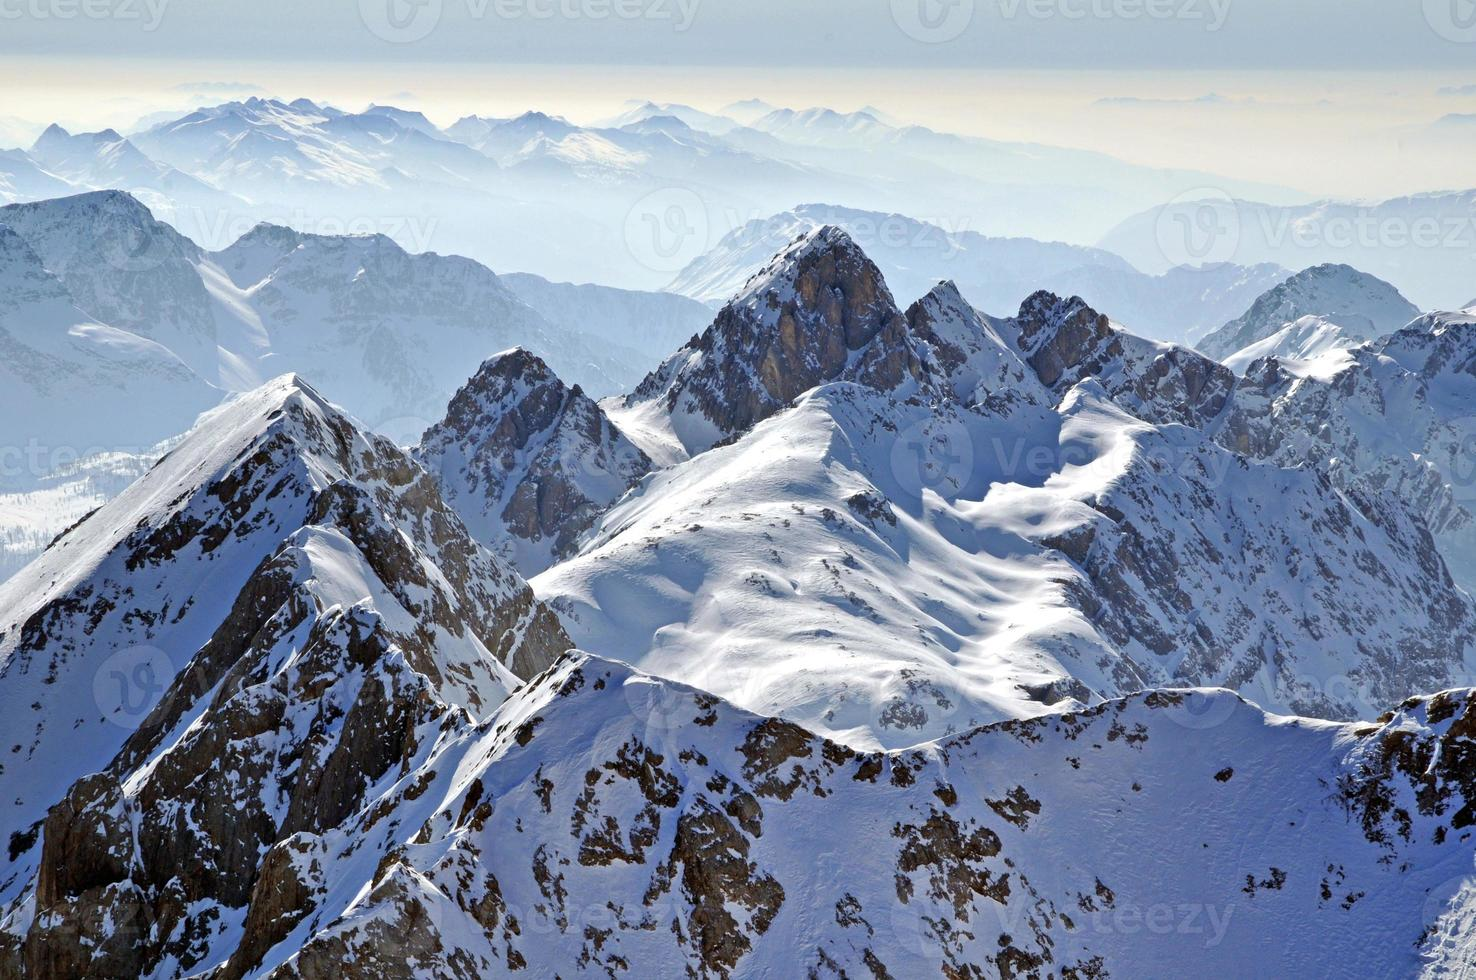 Mountain winter landscape photo